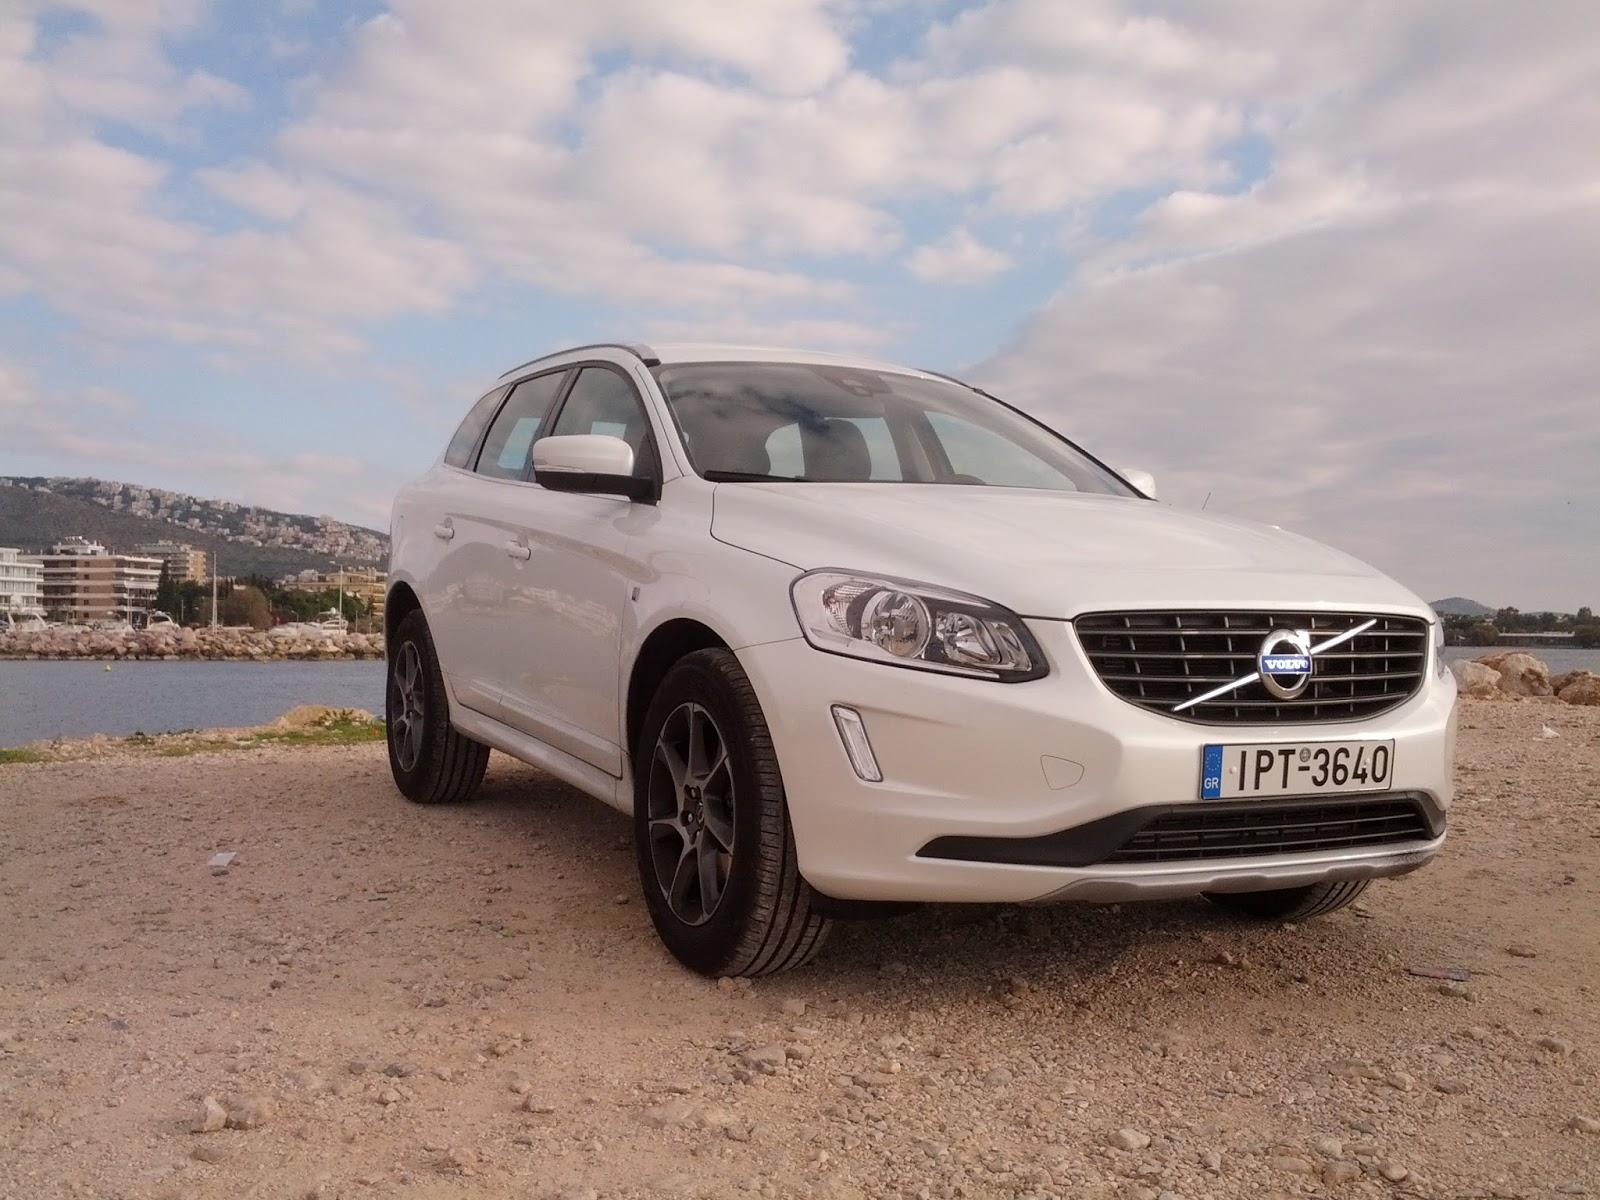 IMG 20151209 144107 Γιατί το Volvo XC60 είναι εθιστικό